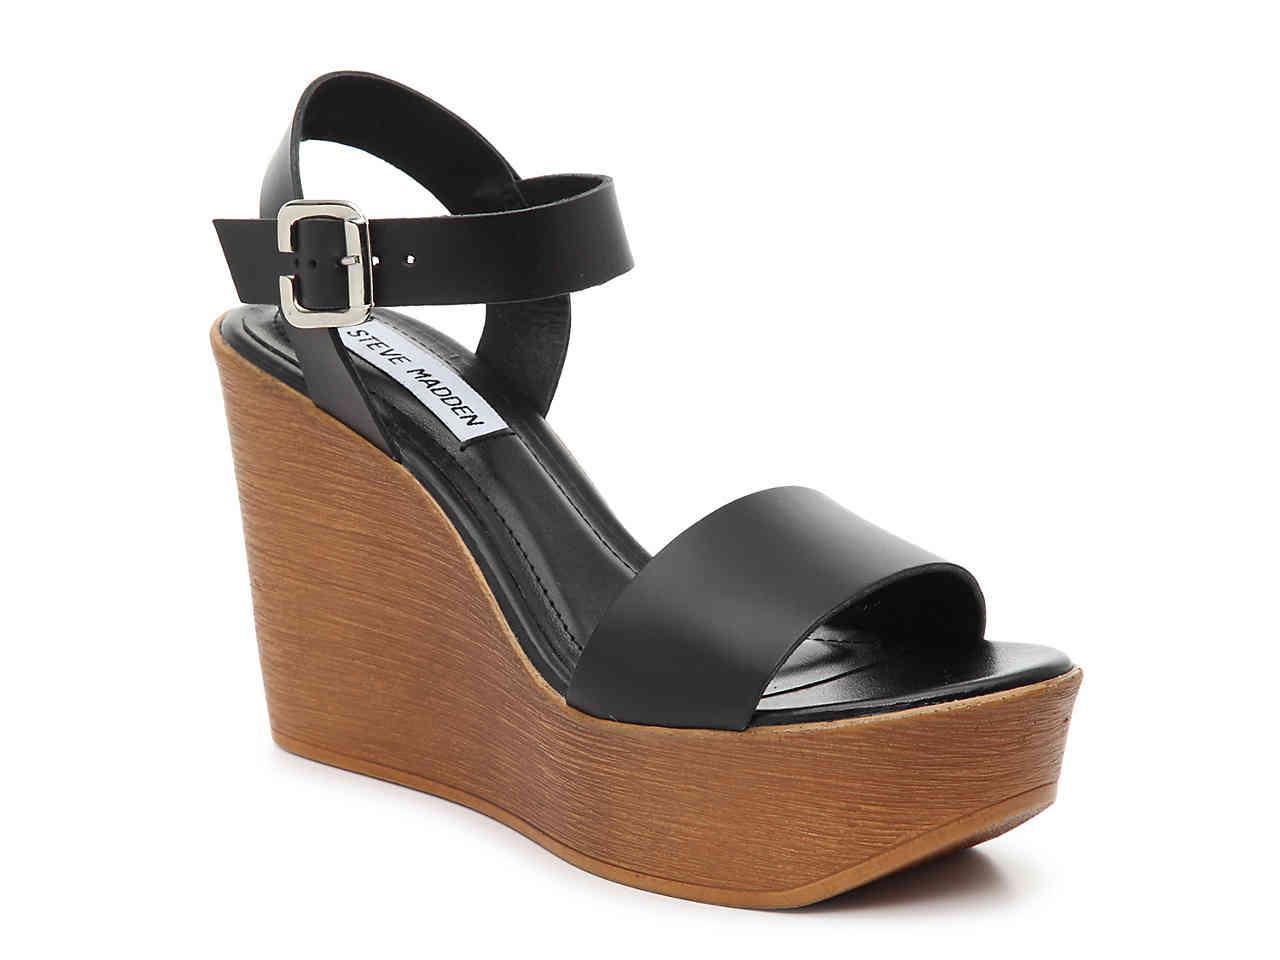 14eec2fa46b Steve Madden - Black Paden Leather Wedge Platform Sandals - Lyst. View  fullscreen